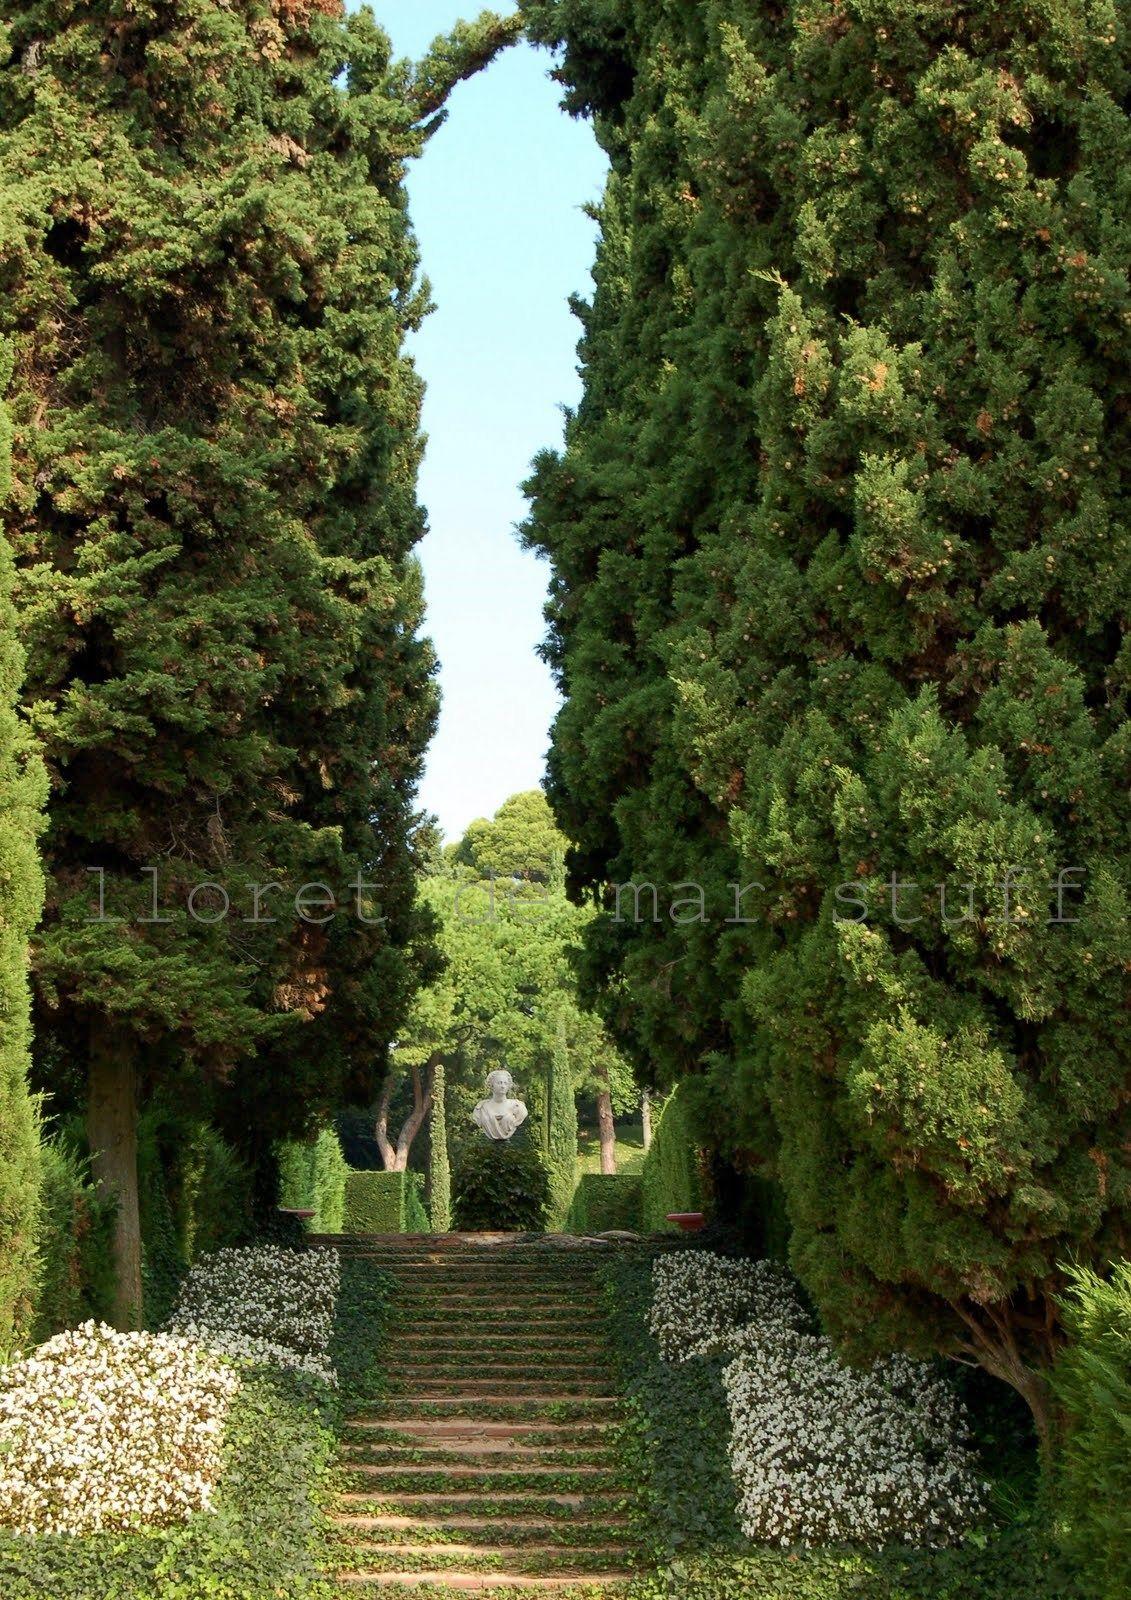 Jardin santa clotilde lloret de mar girona catalonia for Jardines de santa clotilde